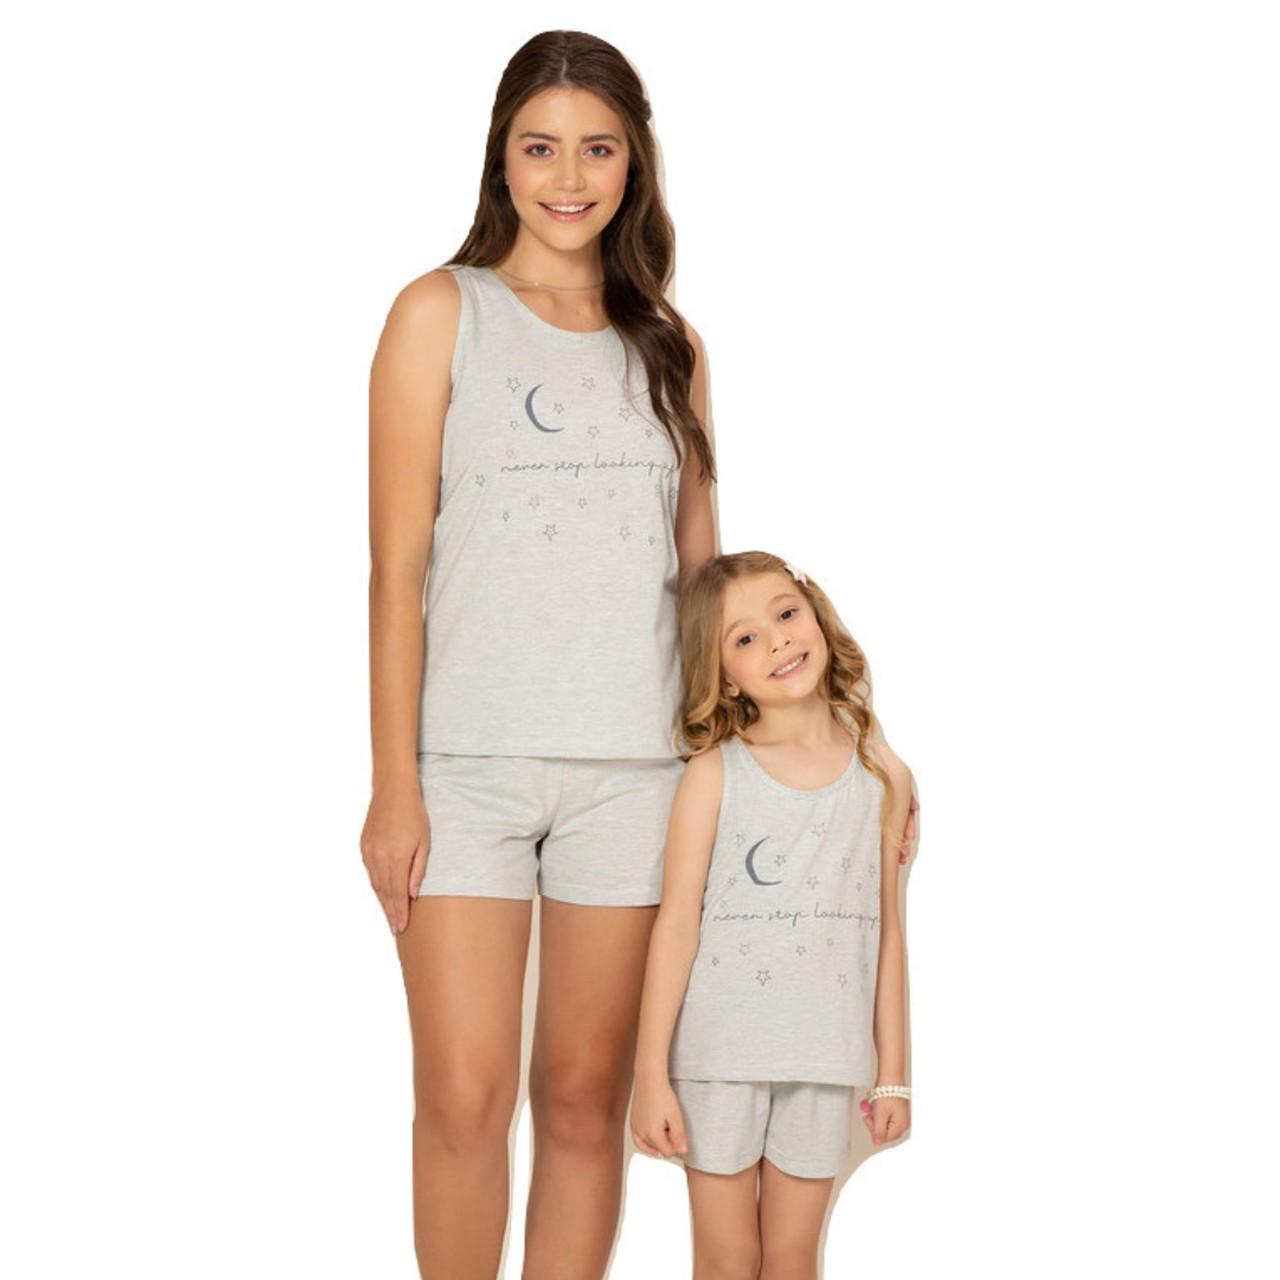 Pijama baby doll verão blusa regata short curto infantil